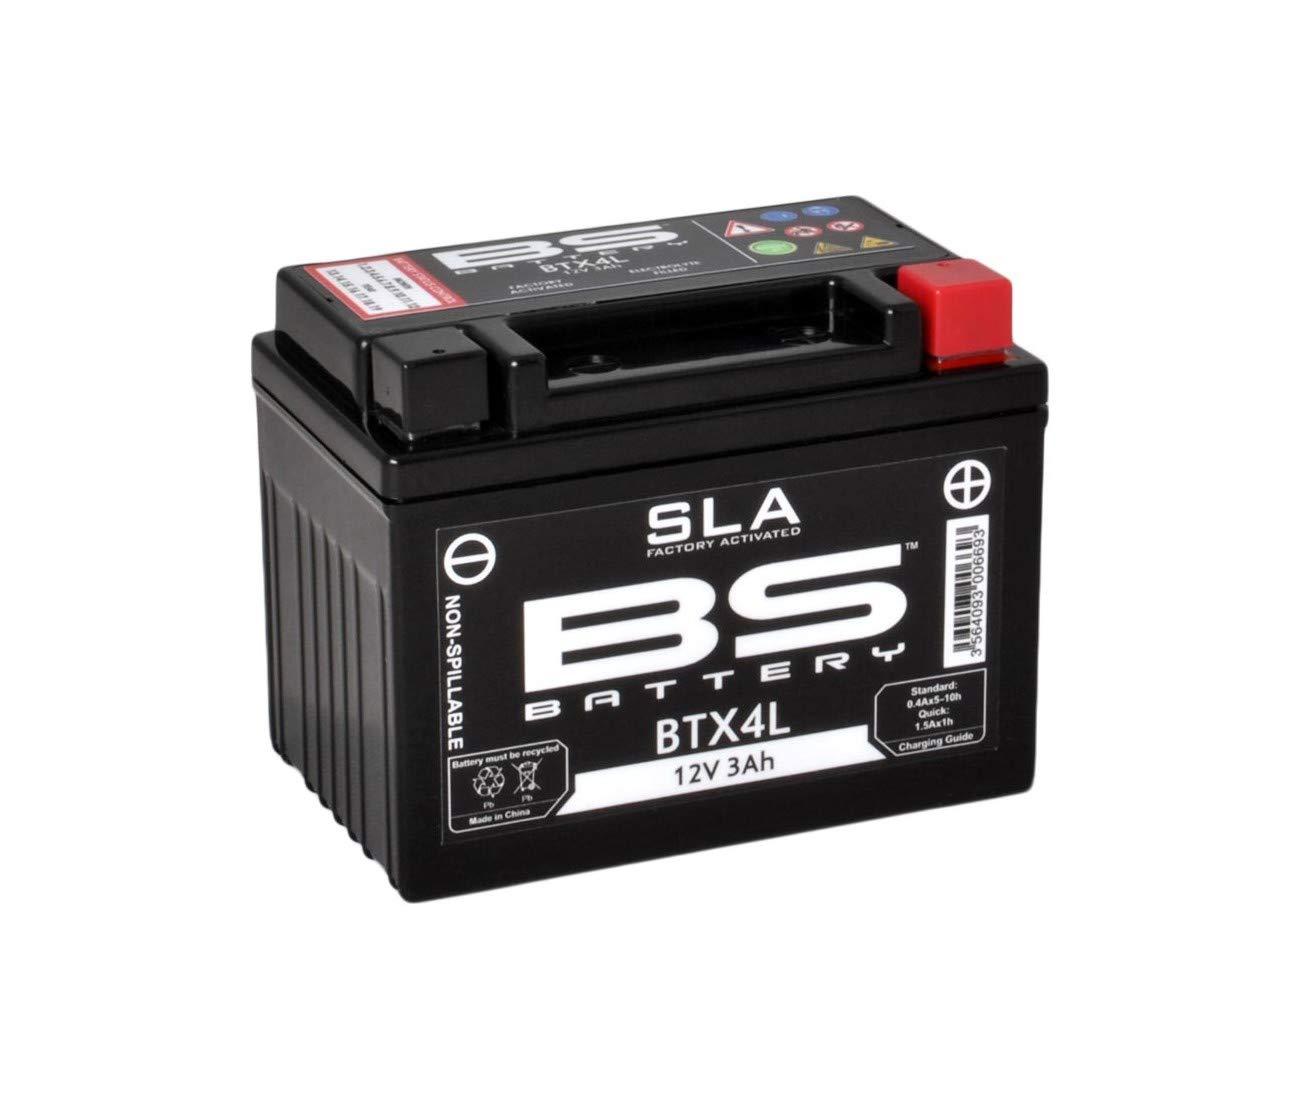 EXC RACING KTM 250/300/350/400/450/500/525-EXC RACING Battery BT4L 1-321047 BS-BS 20257